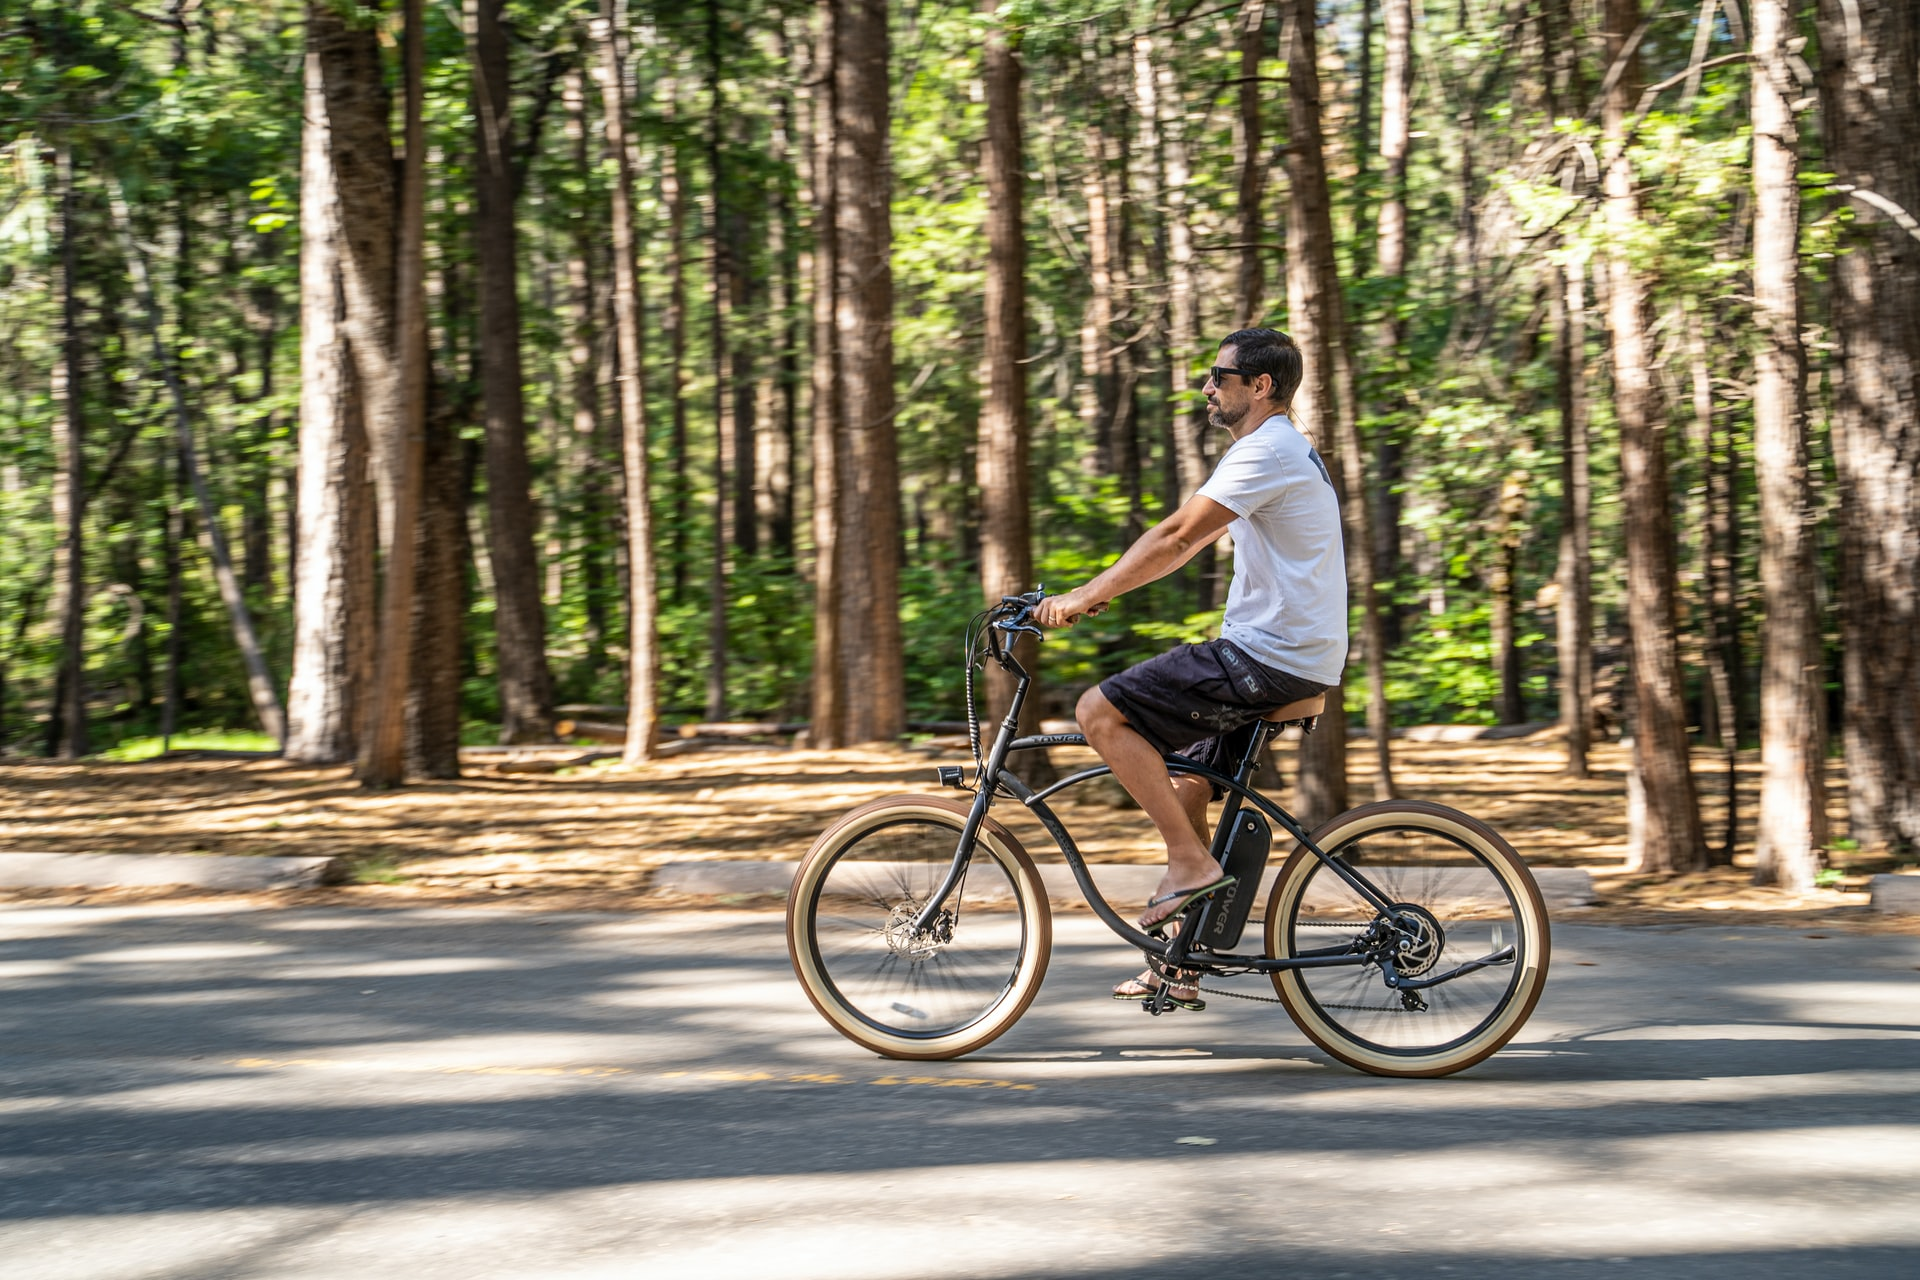 Man riding an e-bike at the park